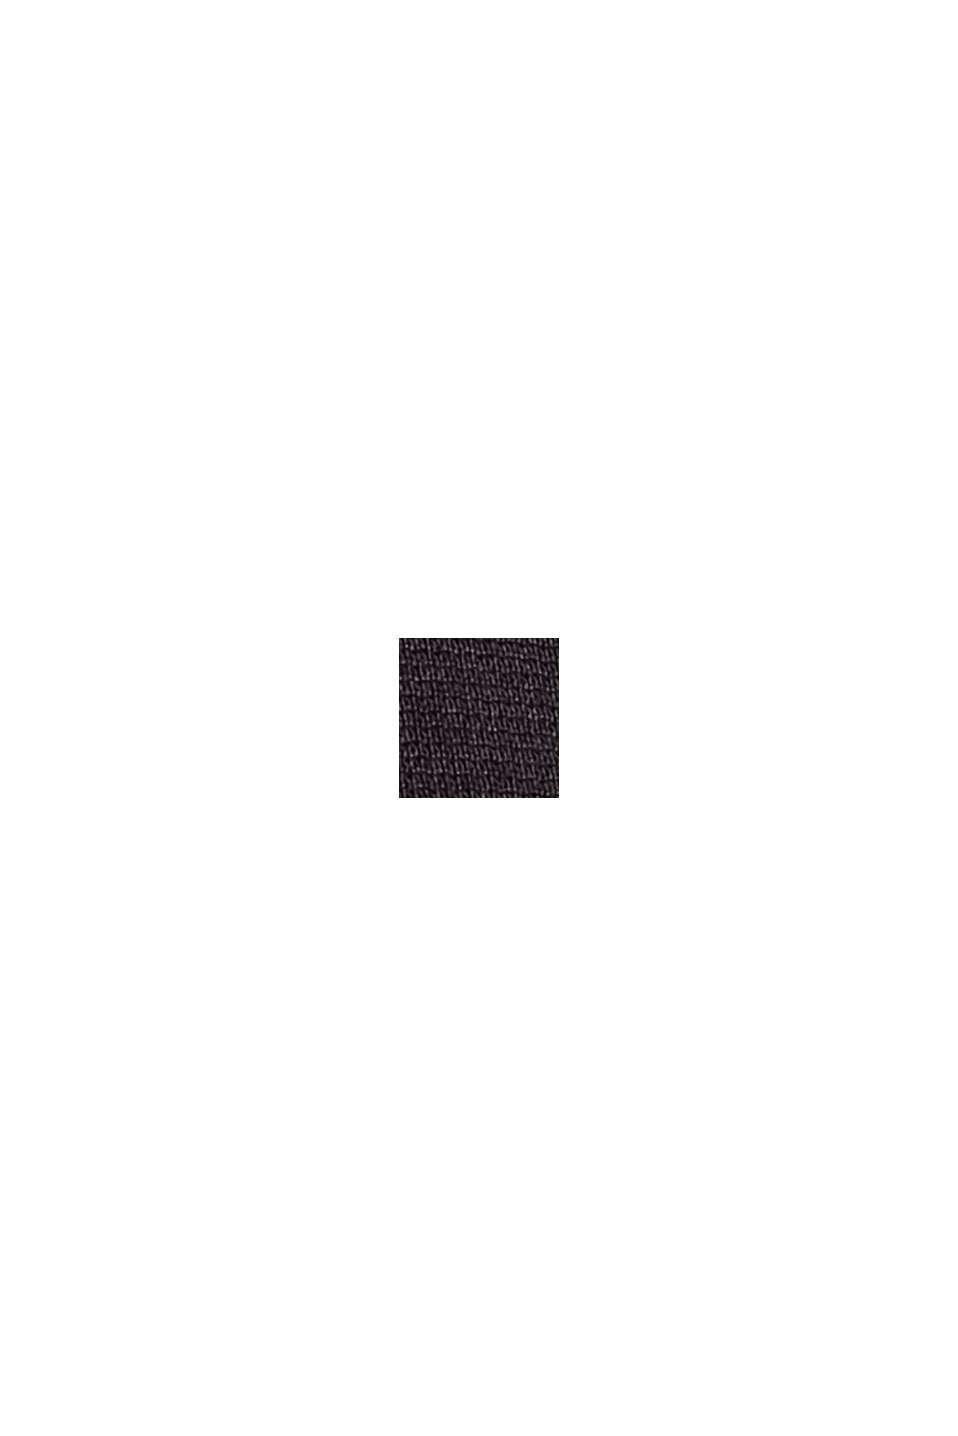 Cardigan lungo in jersey, LENZING™ ECOVERO™, BLACK, swatch